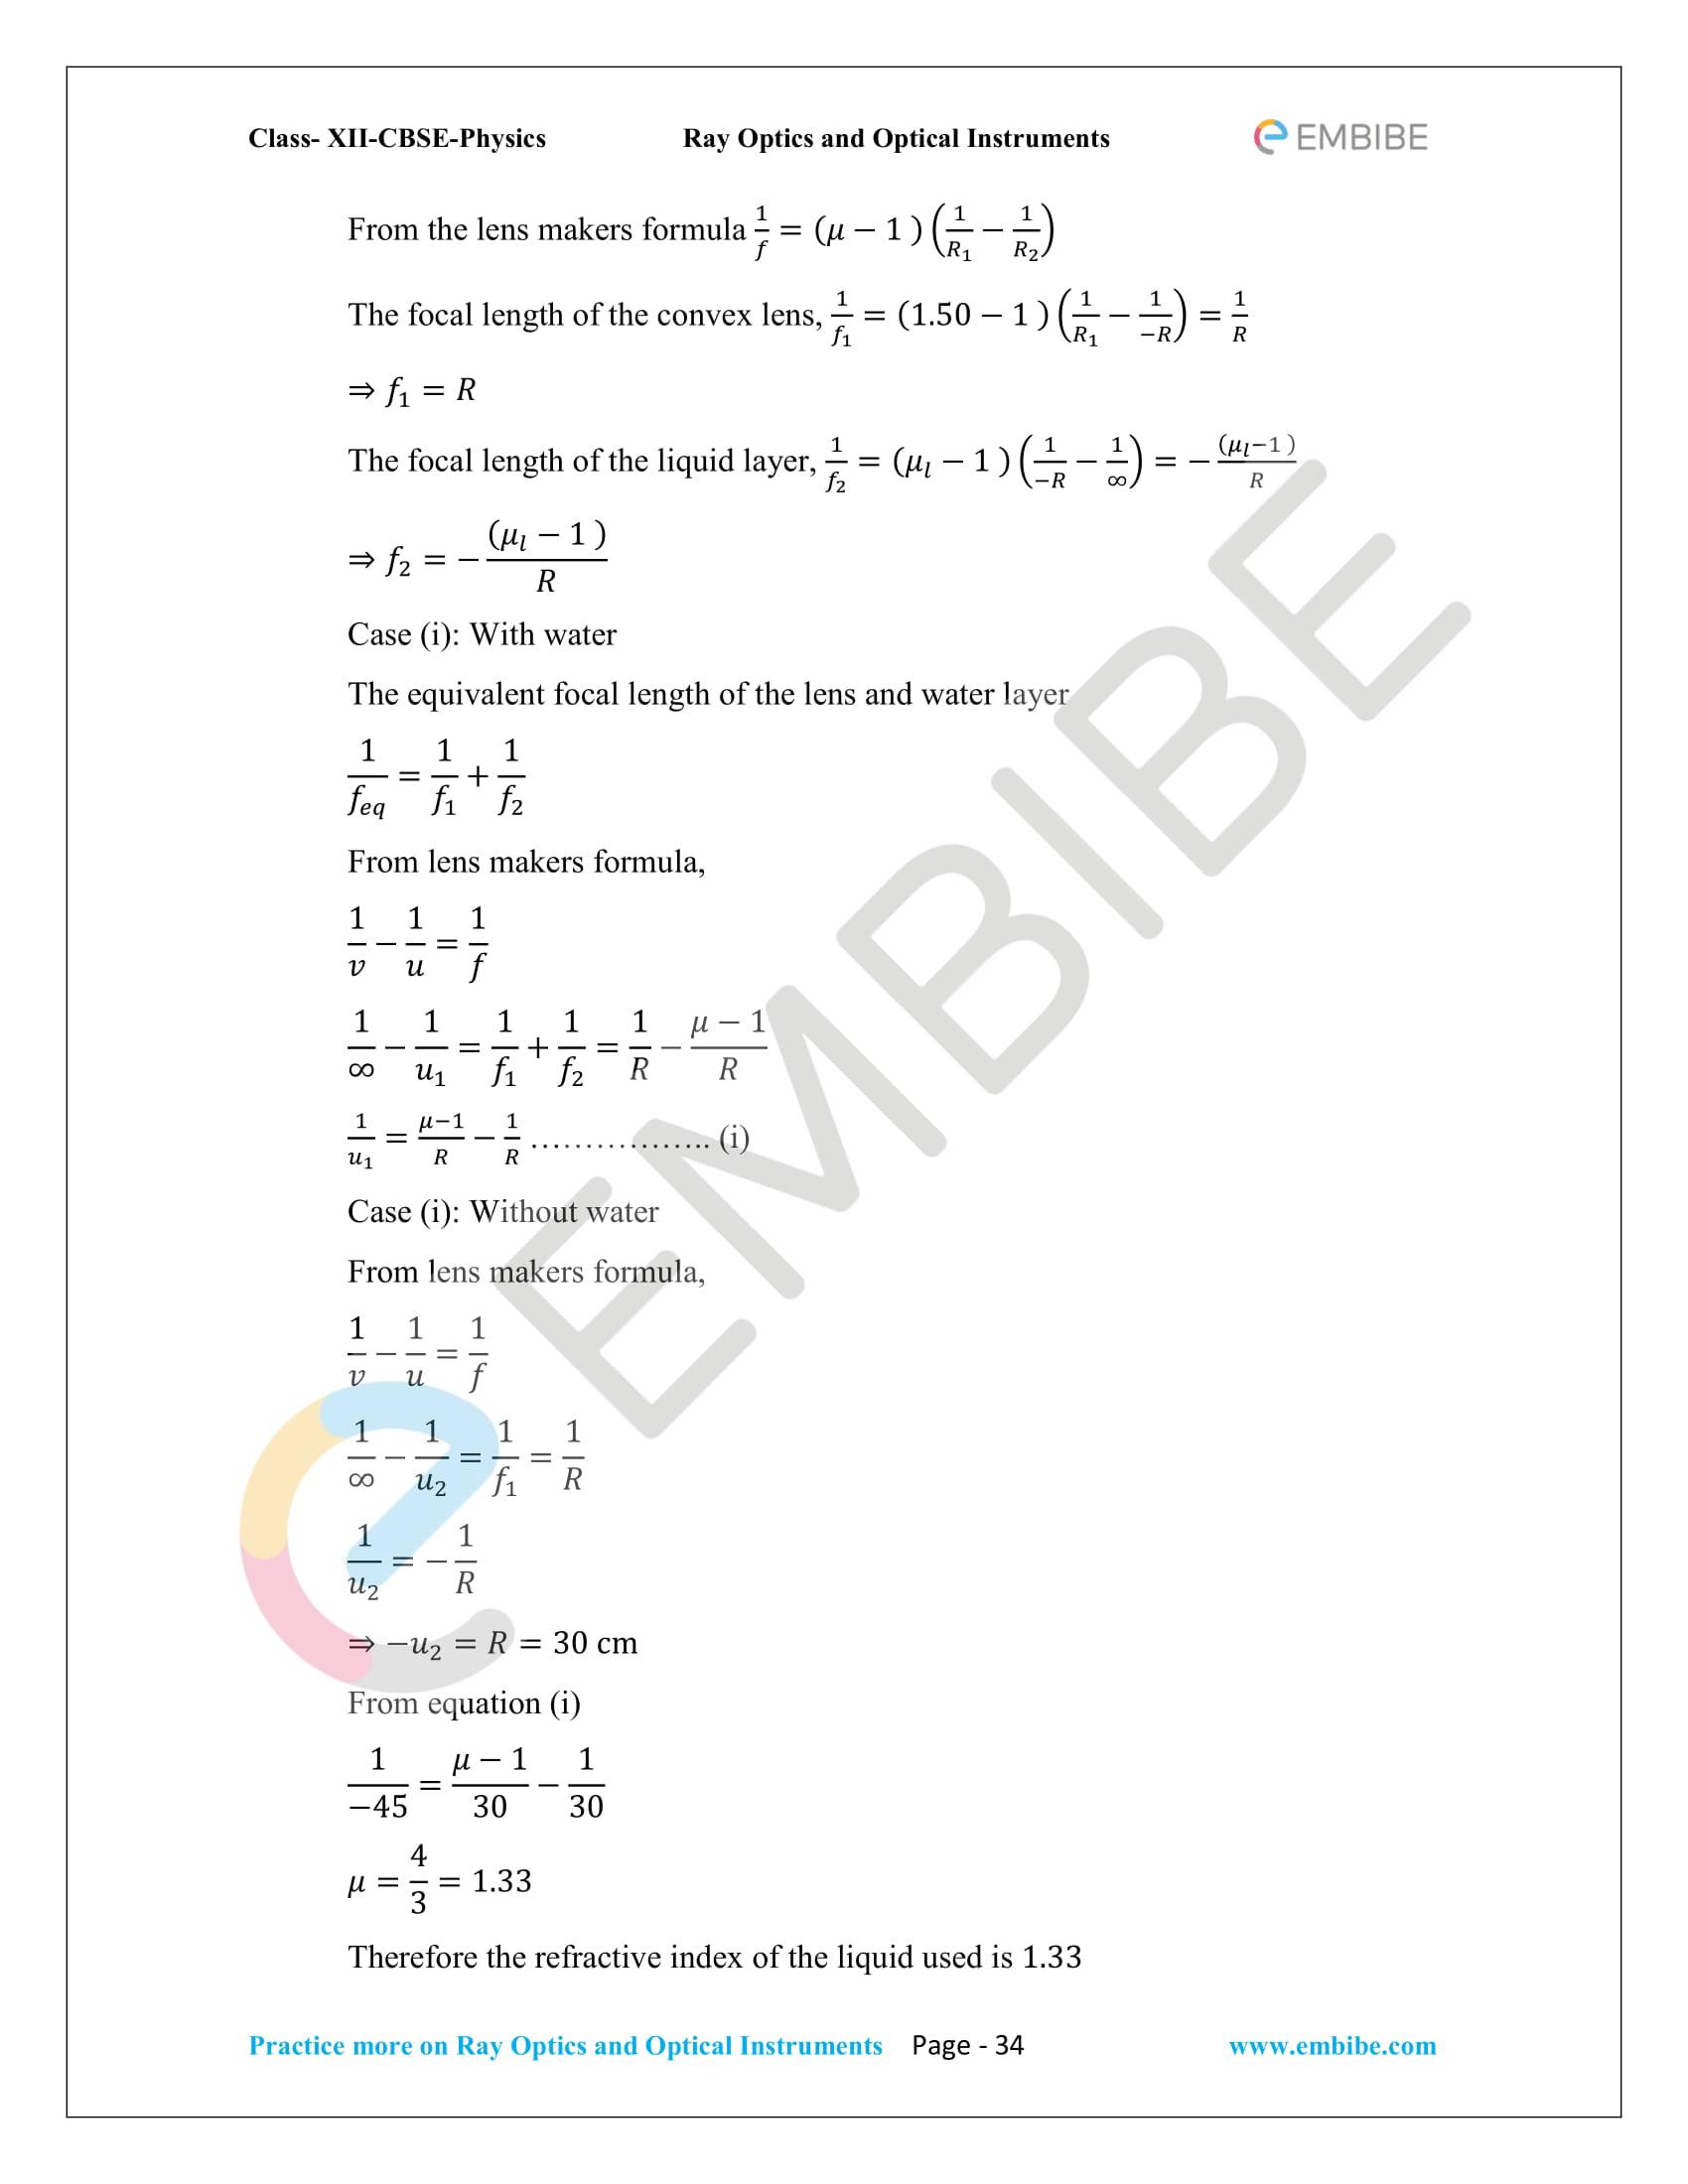 NCERT_Grade 12_Physics_Ch_09_Ray Optics-34